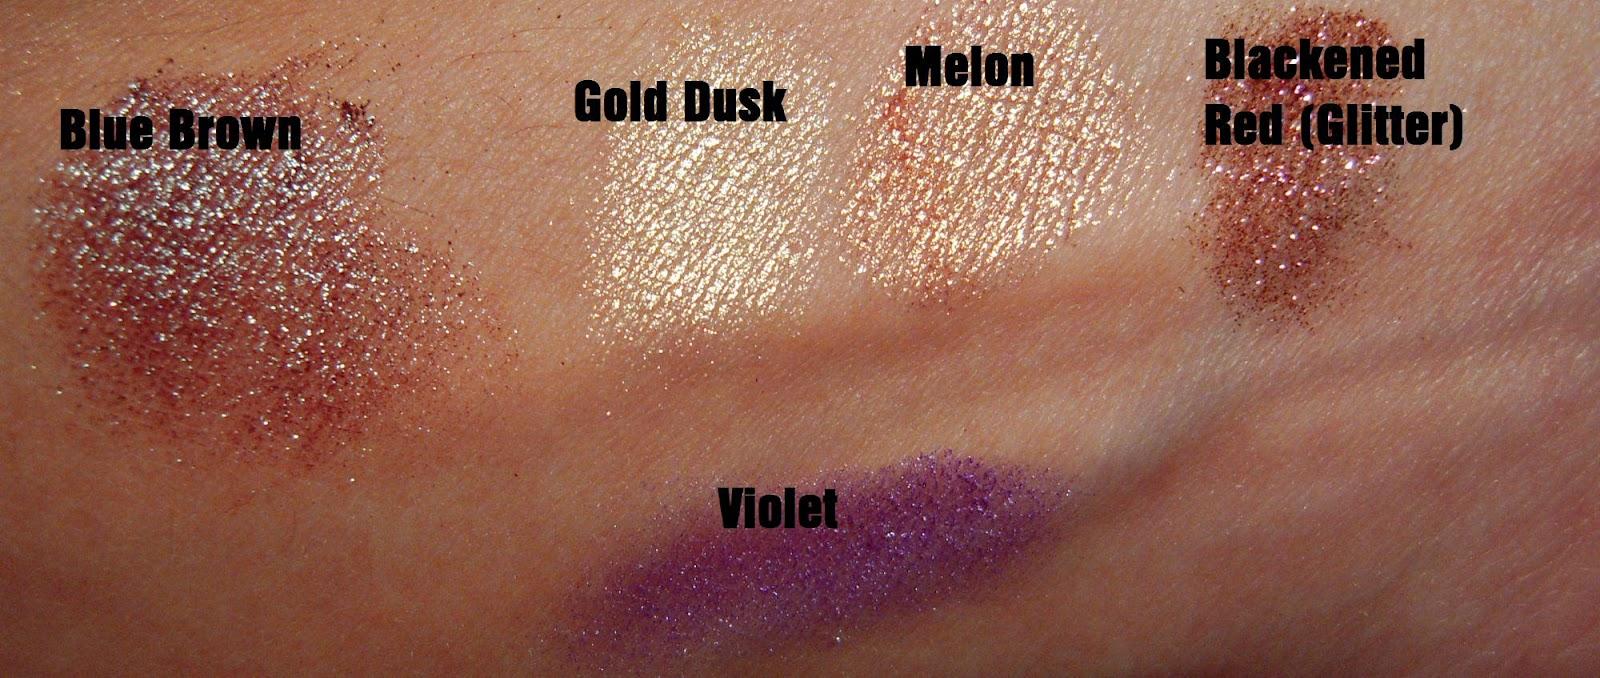 Leliminazione di cosmetology di pigmentary nota su una faccia